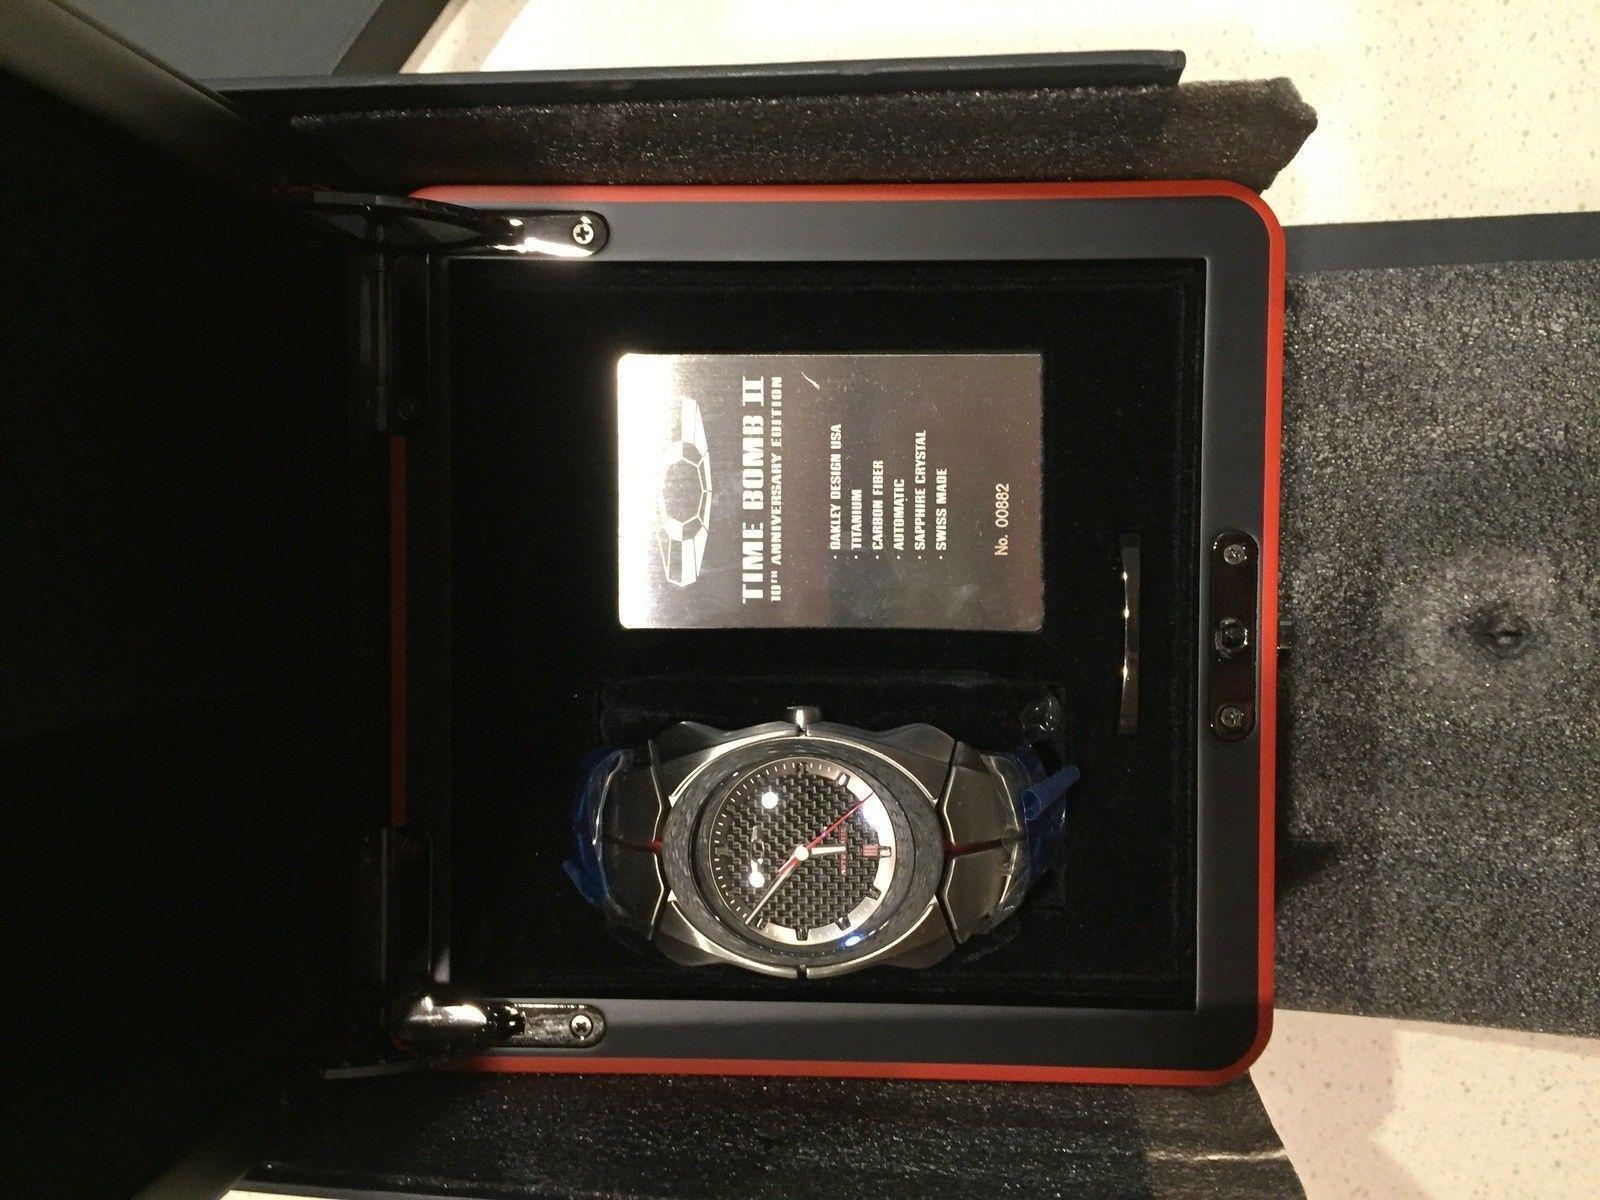 Oakley Time Bomb II 10th Anniversary Edition BNIB - image7.JPG